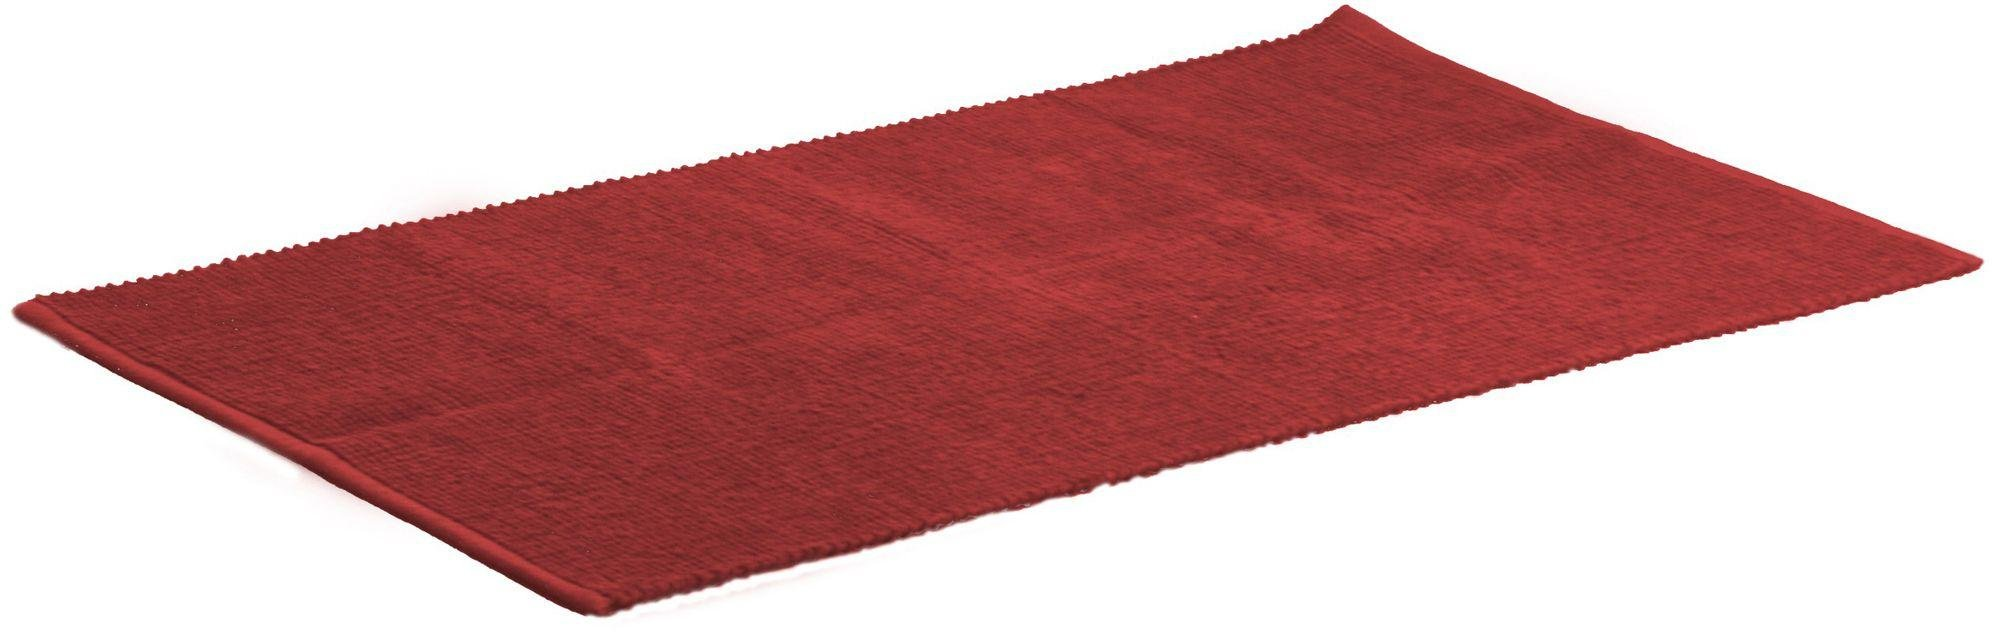 sabichi-woven-chenille-rug-90x150cm-scarlet